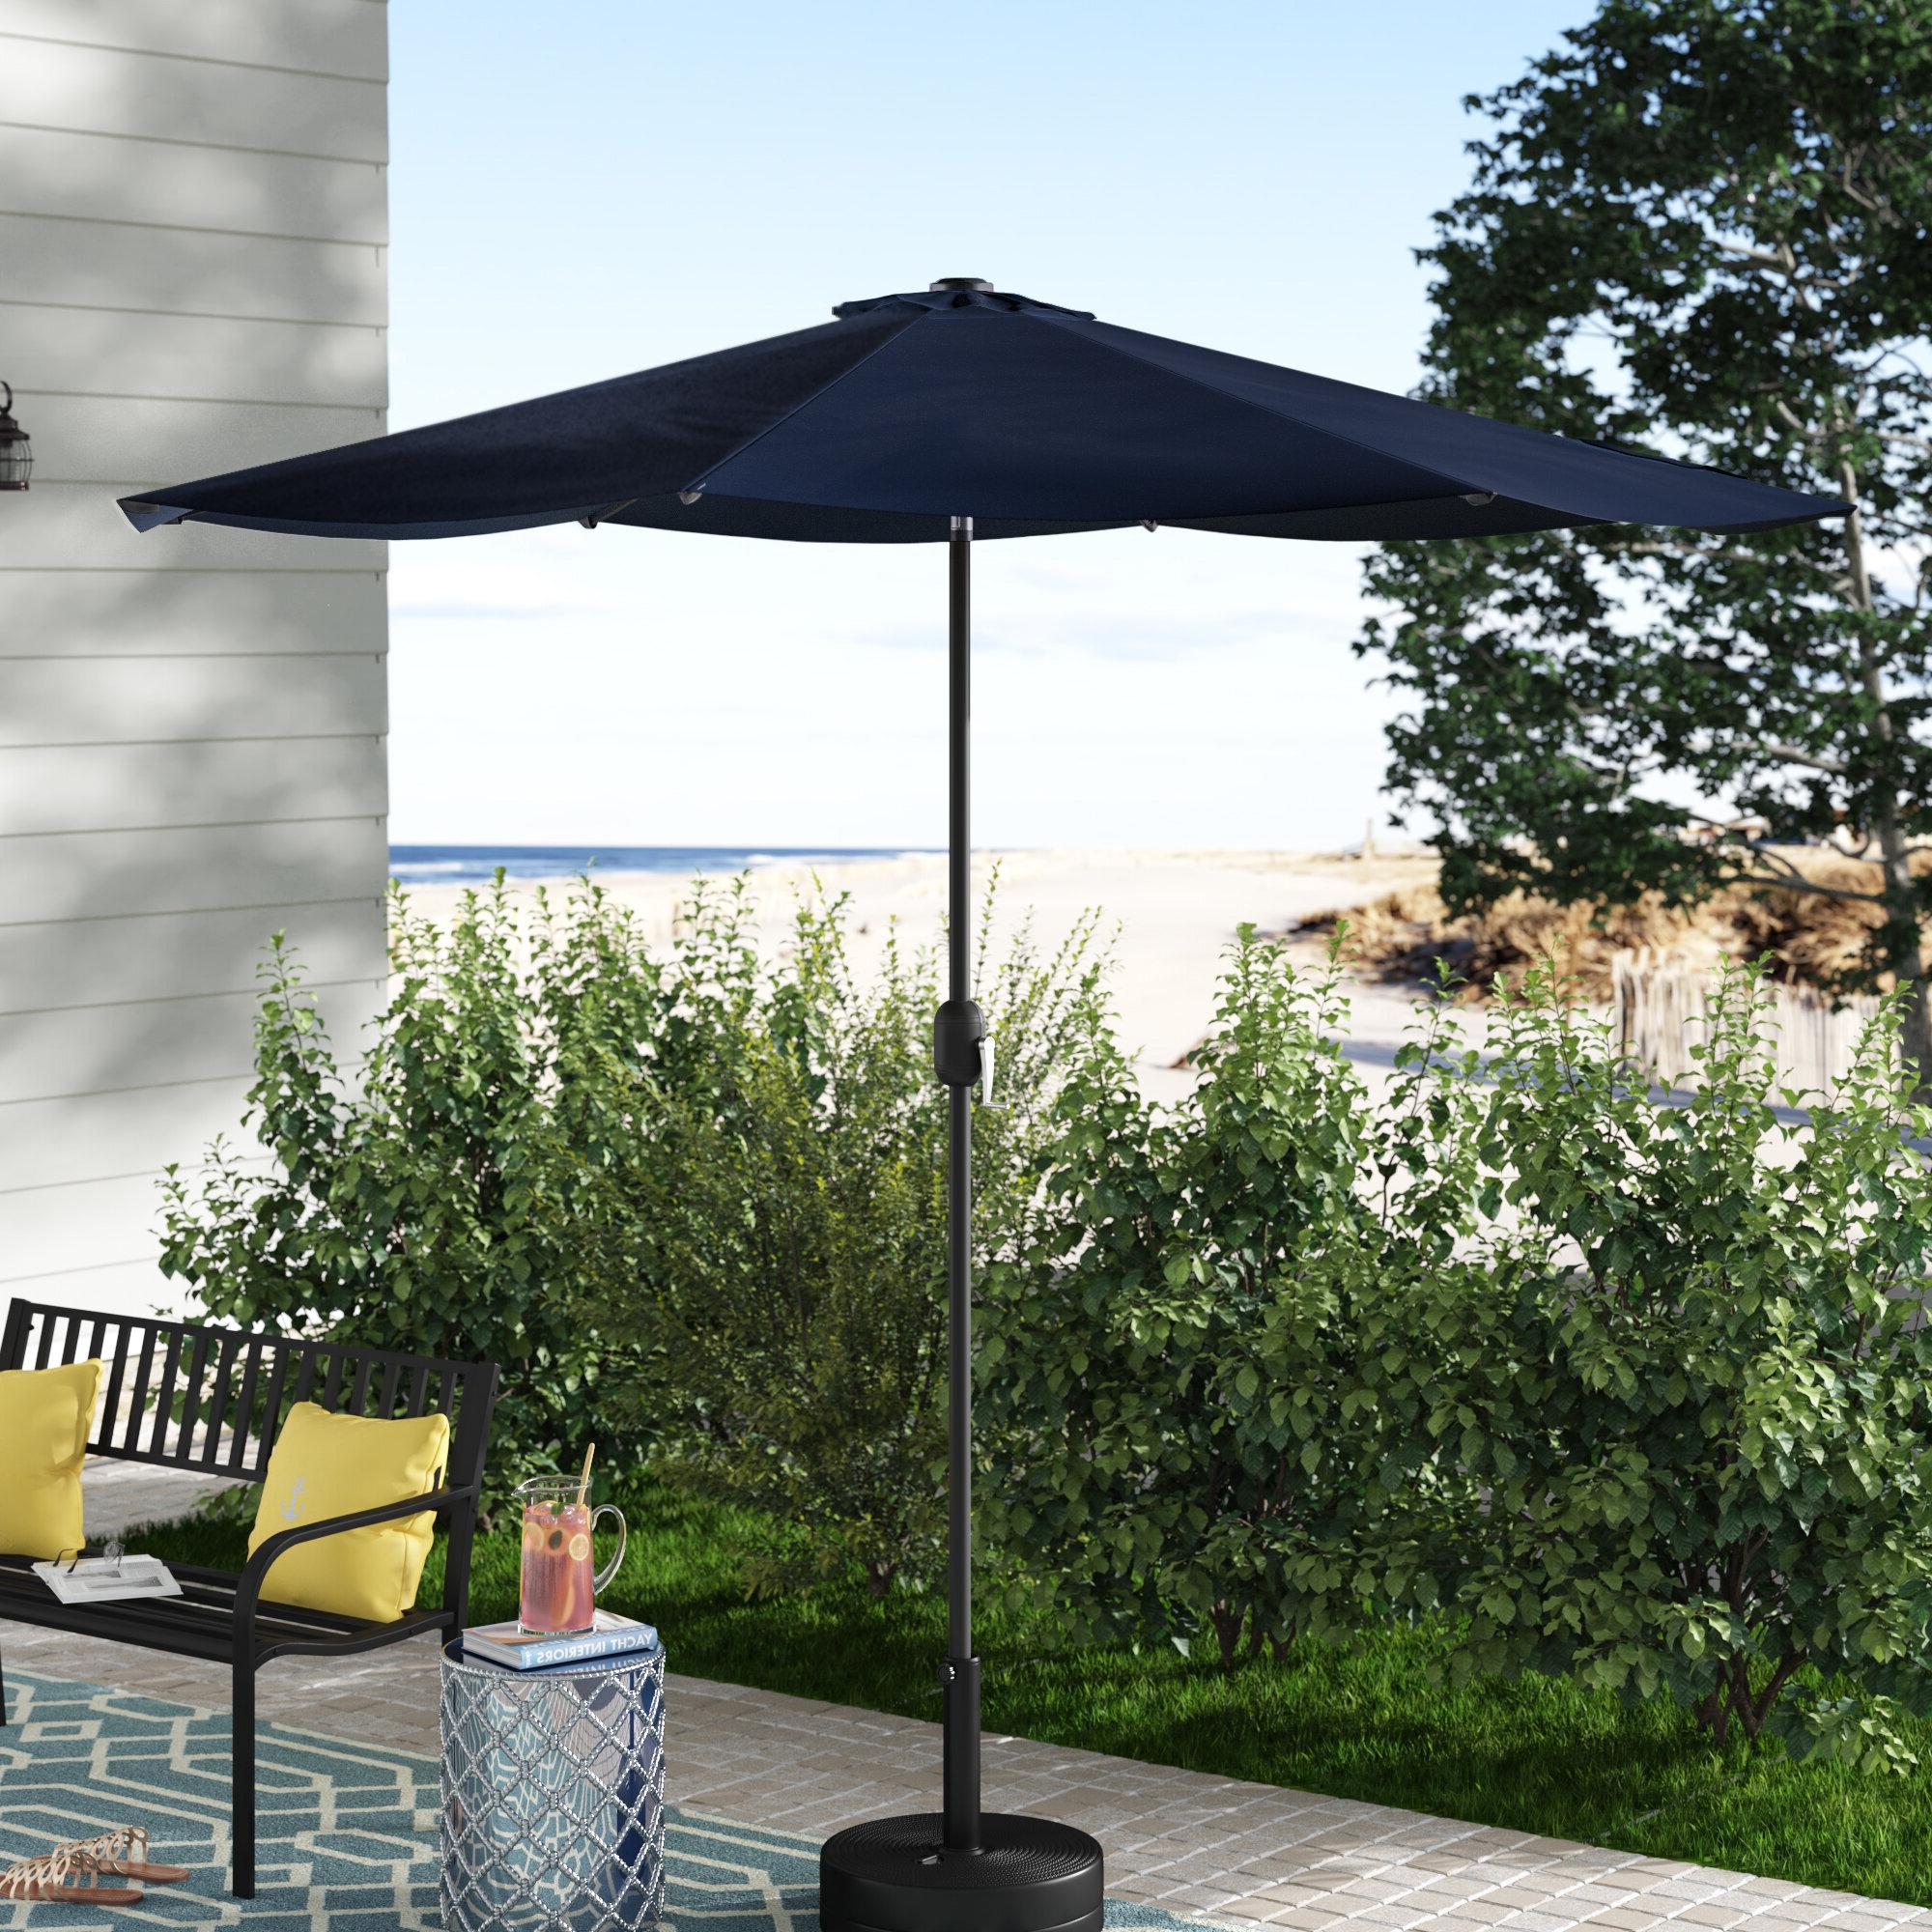 Julian 9' Market Sunbrella Umbrella Regarding 2019 Wiechmann Market Sunbrella Umbrellas (View 7 of 20)